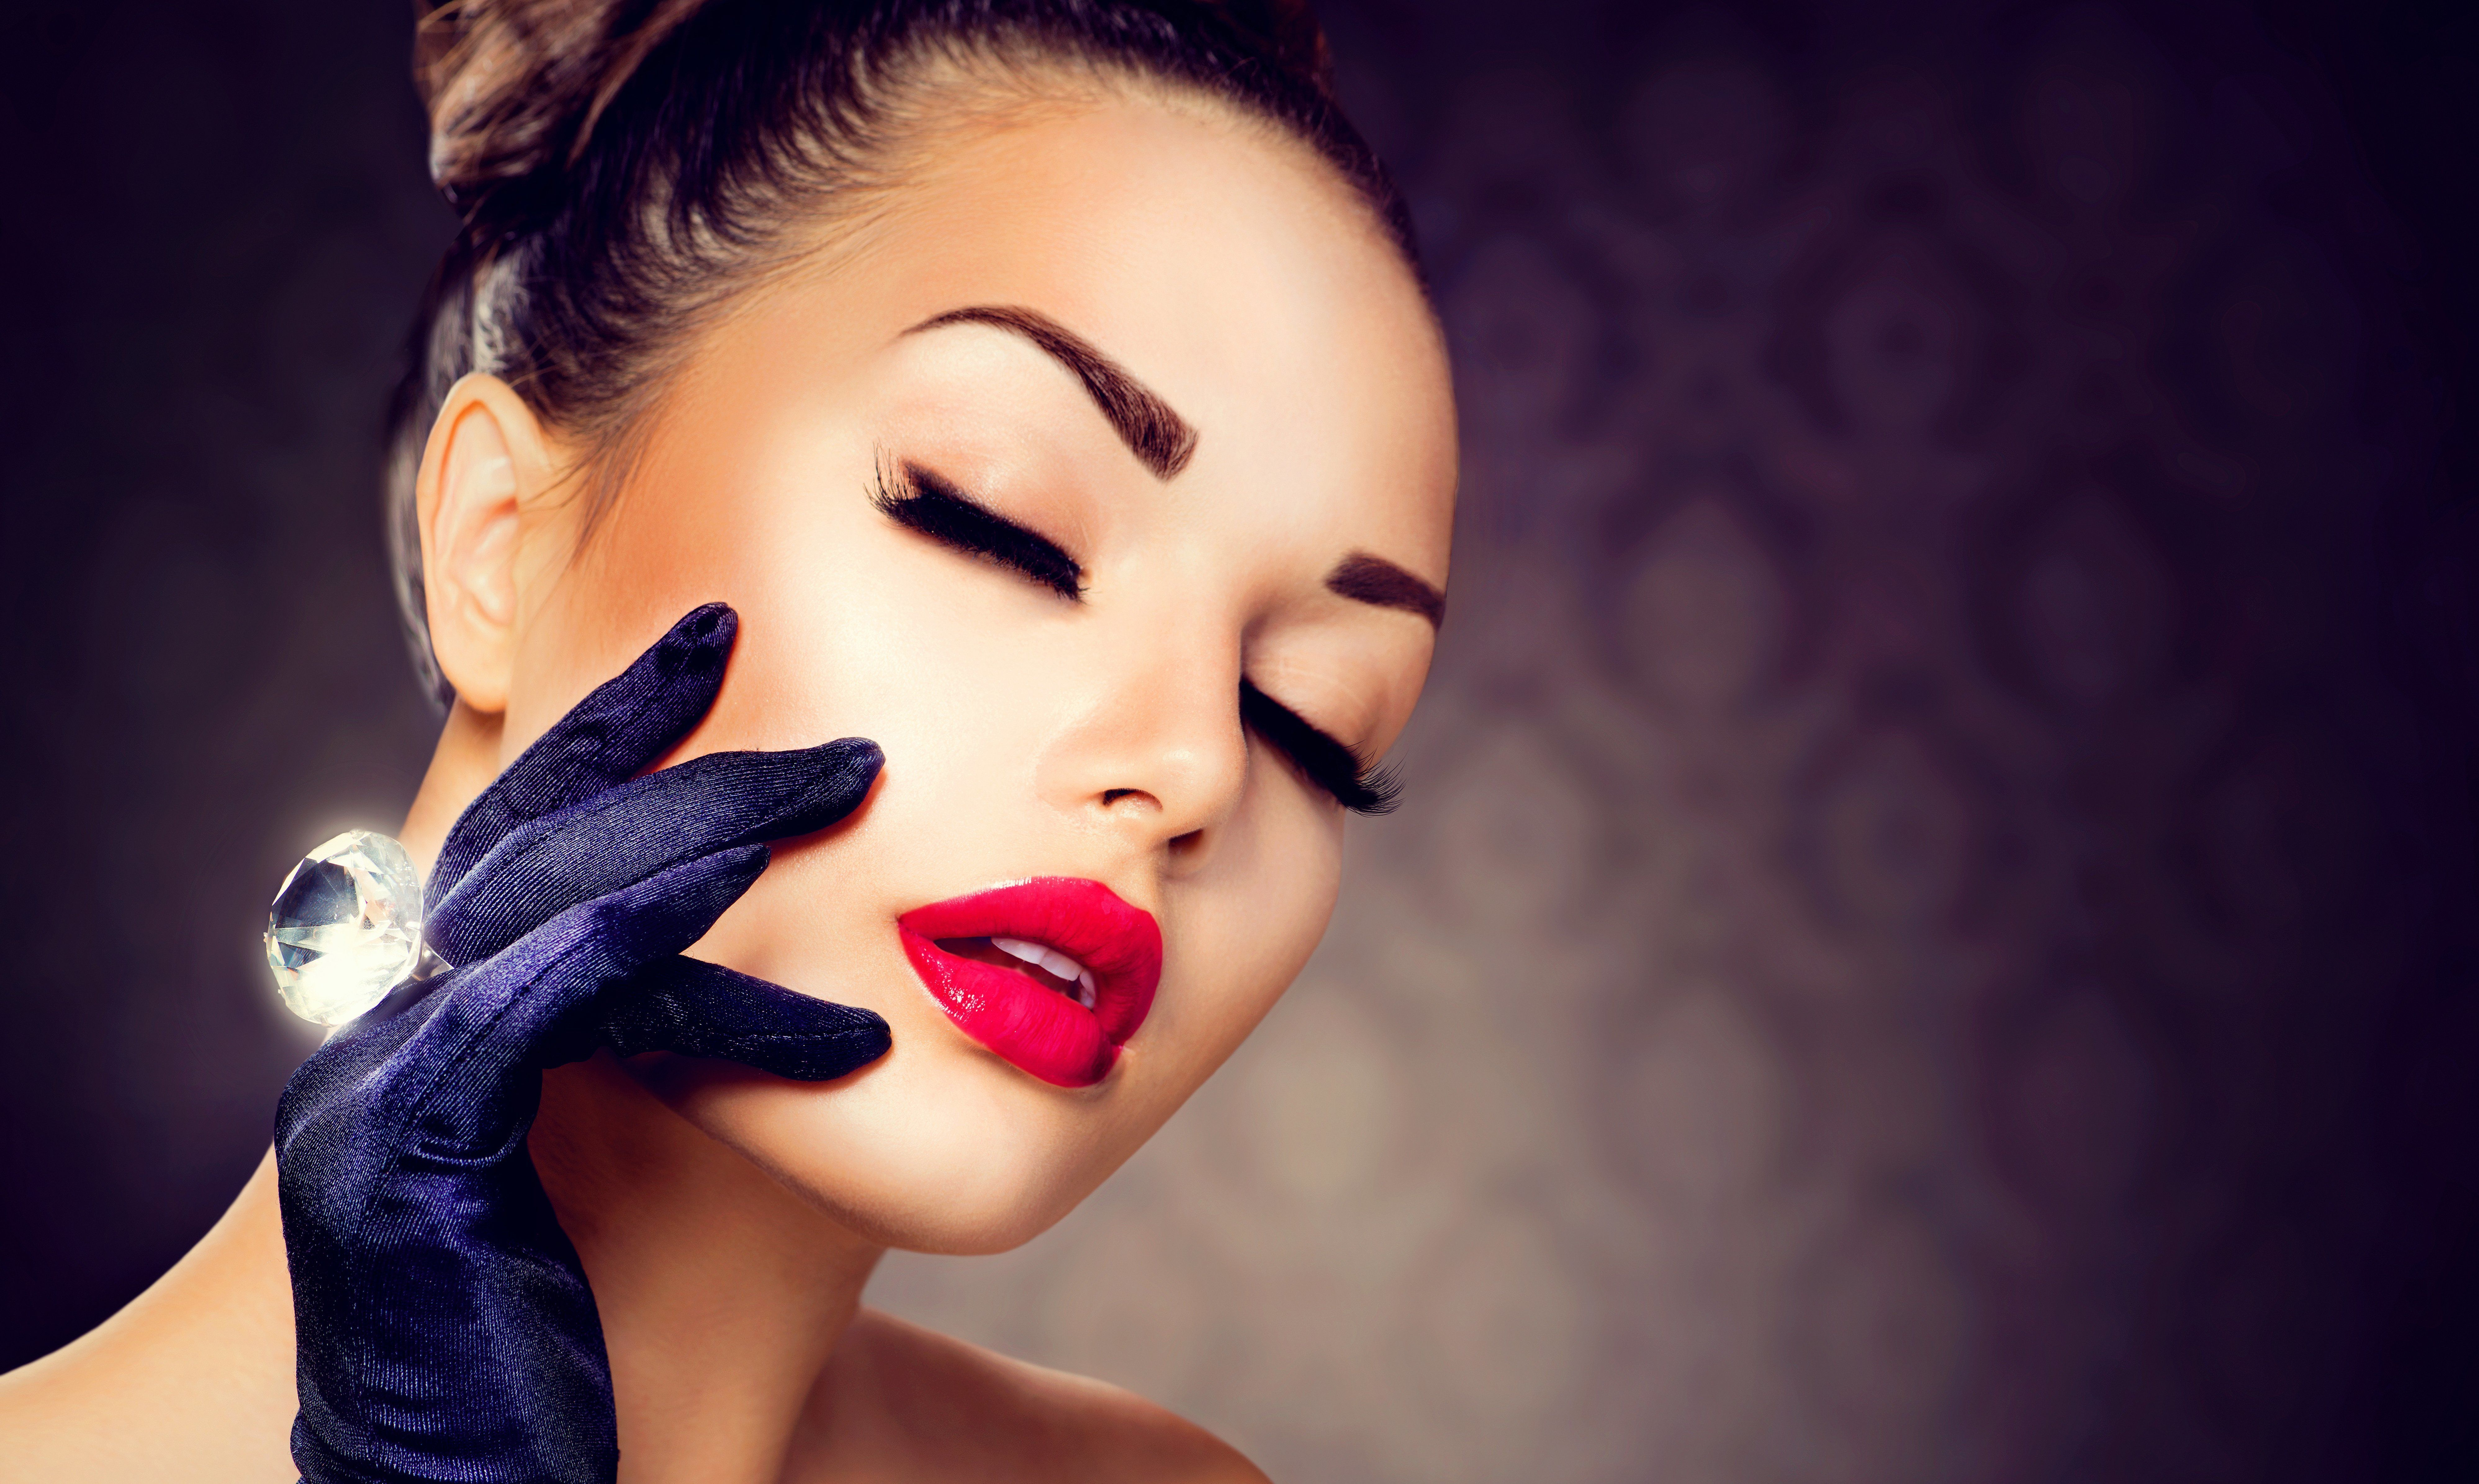 Full HD 1080p, Best HD Makeup Wallpapers, HBC333 Gallery